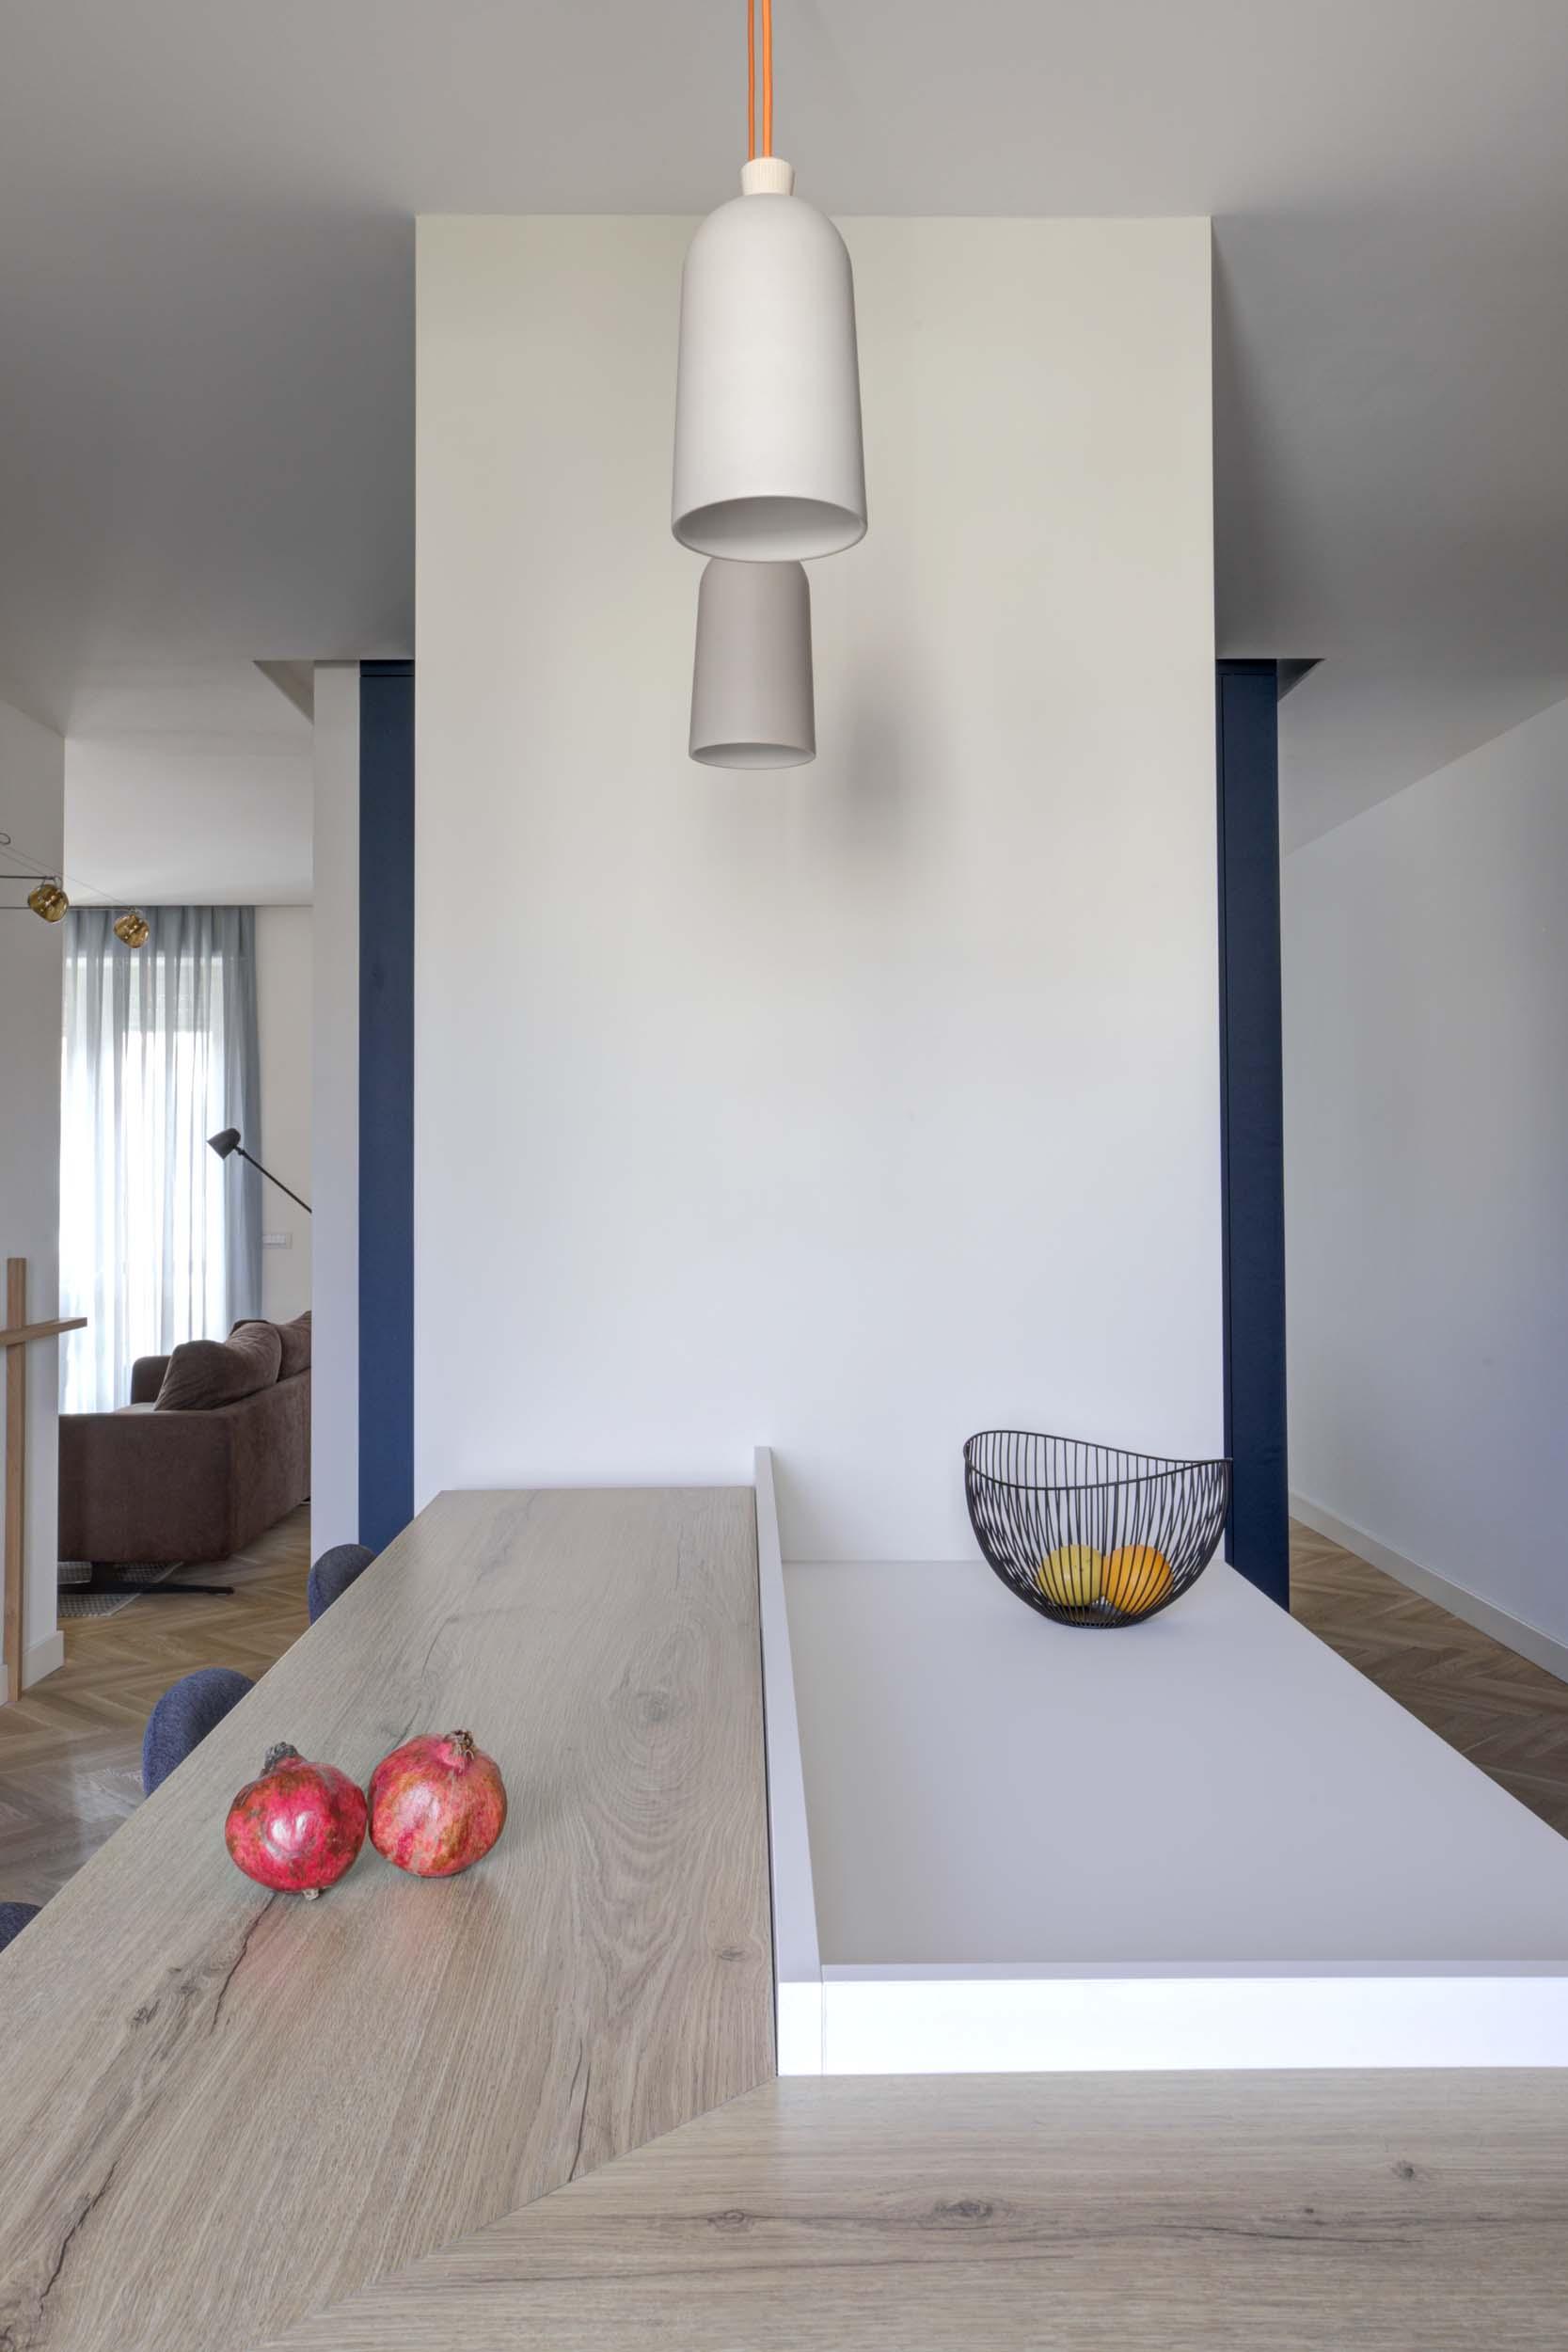 Essenza Studio - Via Lugaro